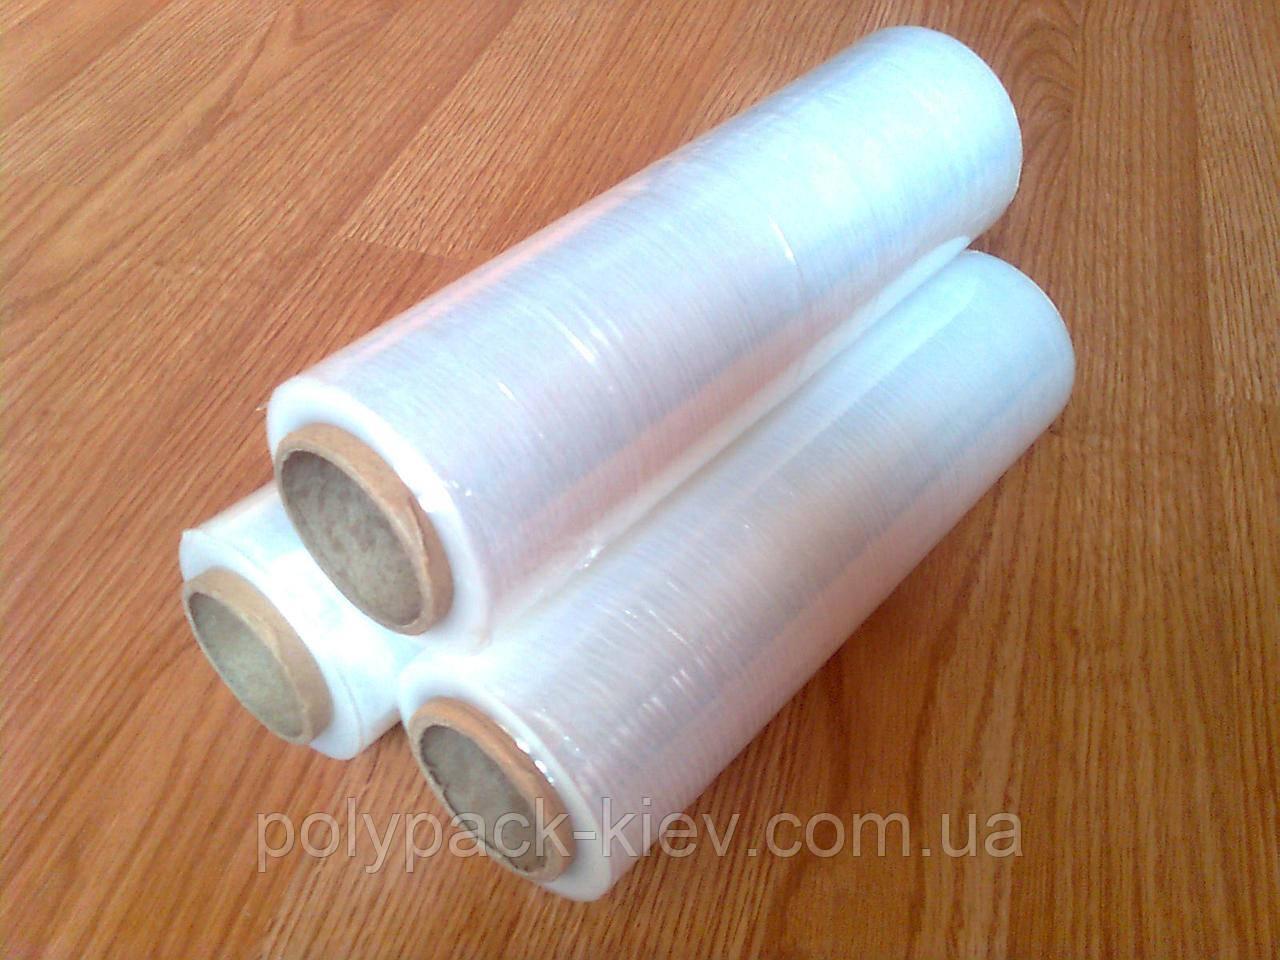 Стрейч пленка 17 мкм*250 мм*150 м прозрачная, упаковочная стрейч пленка, купить стрейч пленку Киев